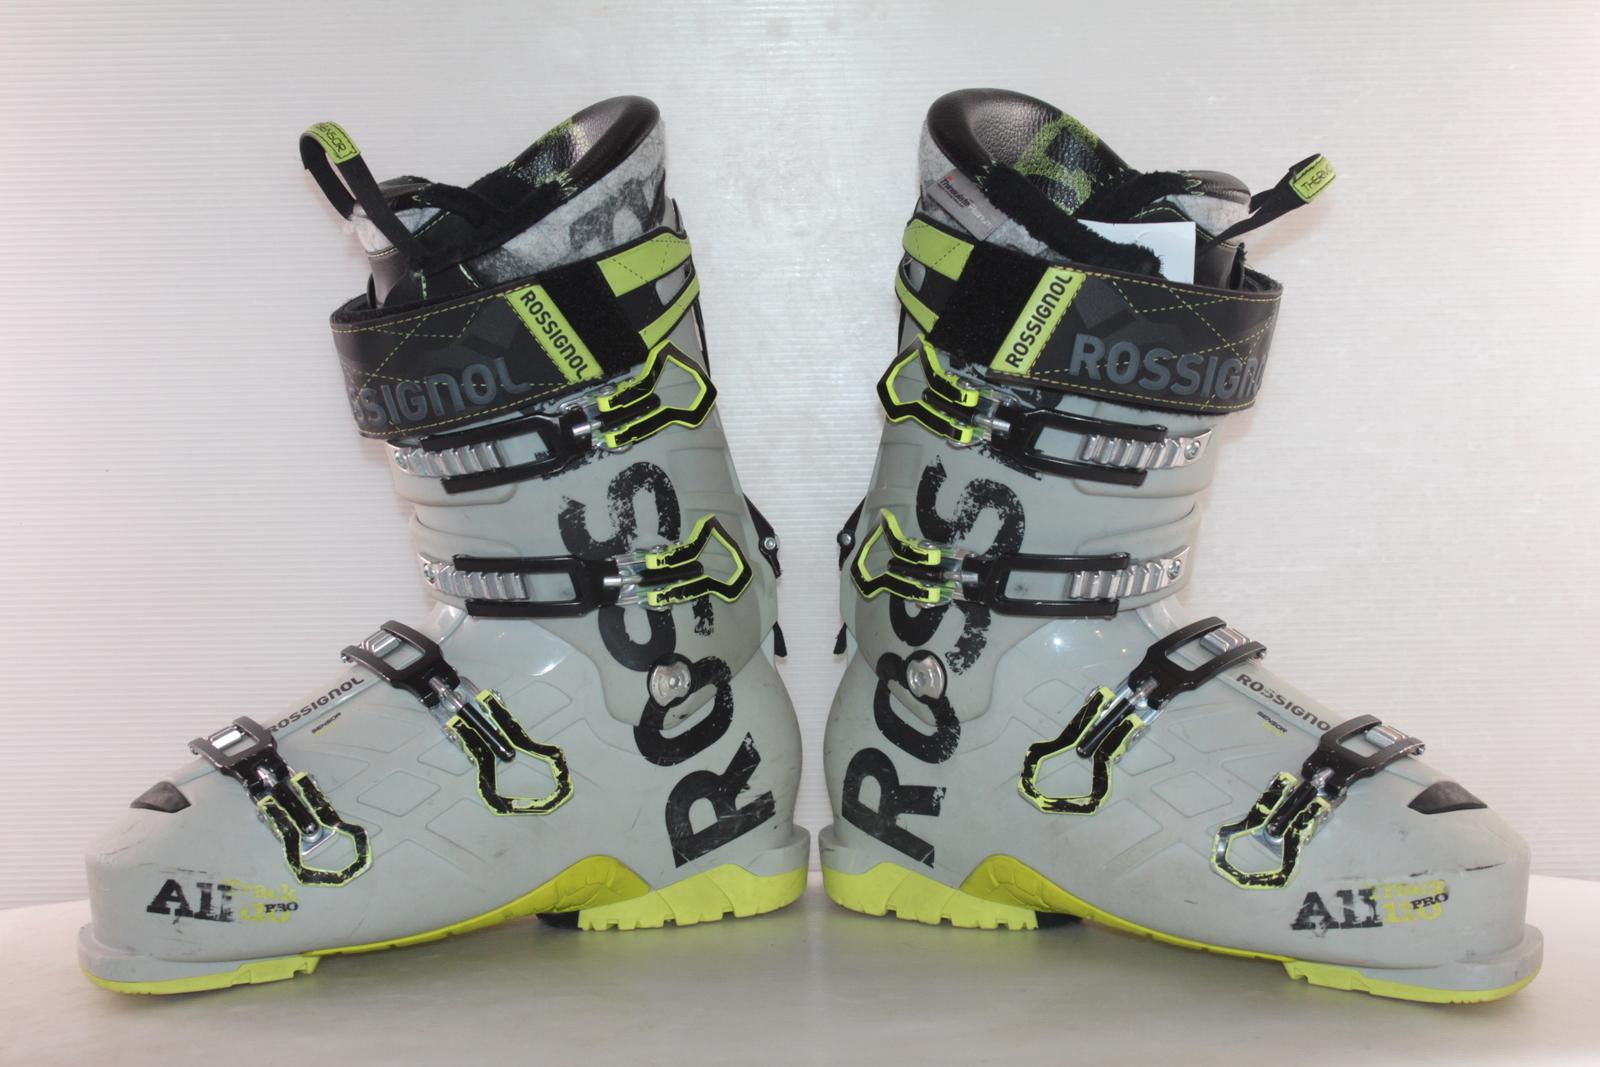 Lyžařské boty Rossignol All Track 110 Pro vel. EU43.5 flexe 110